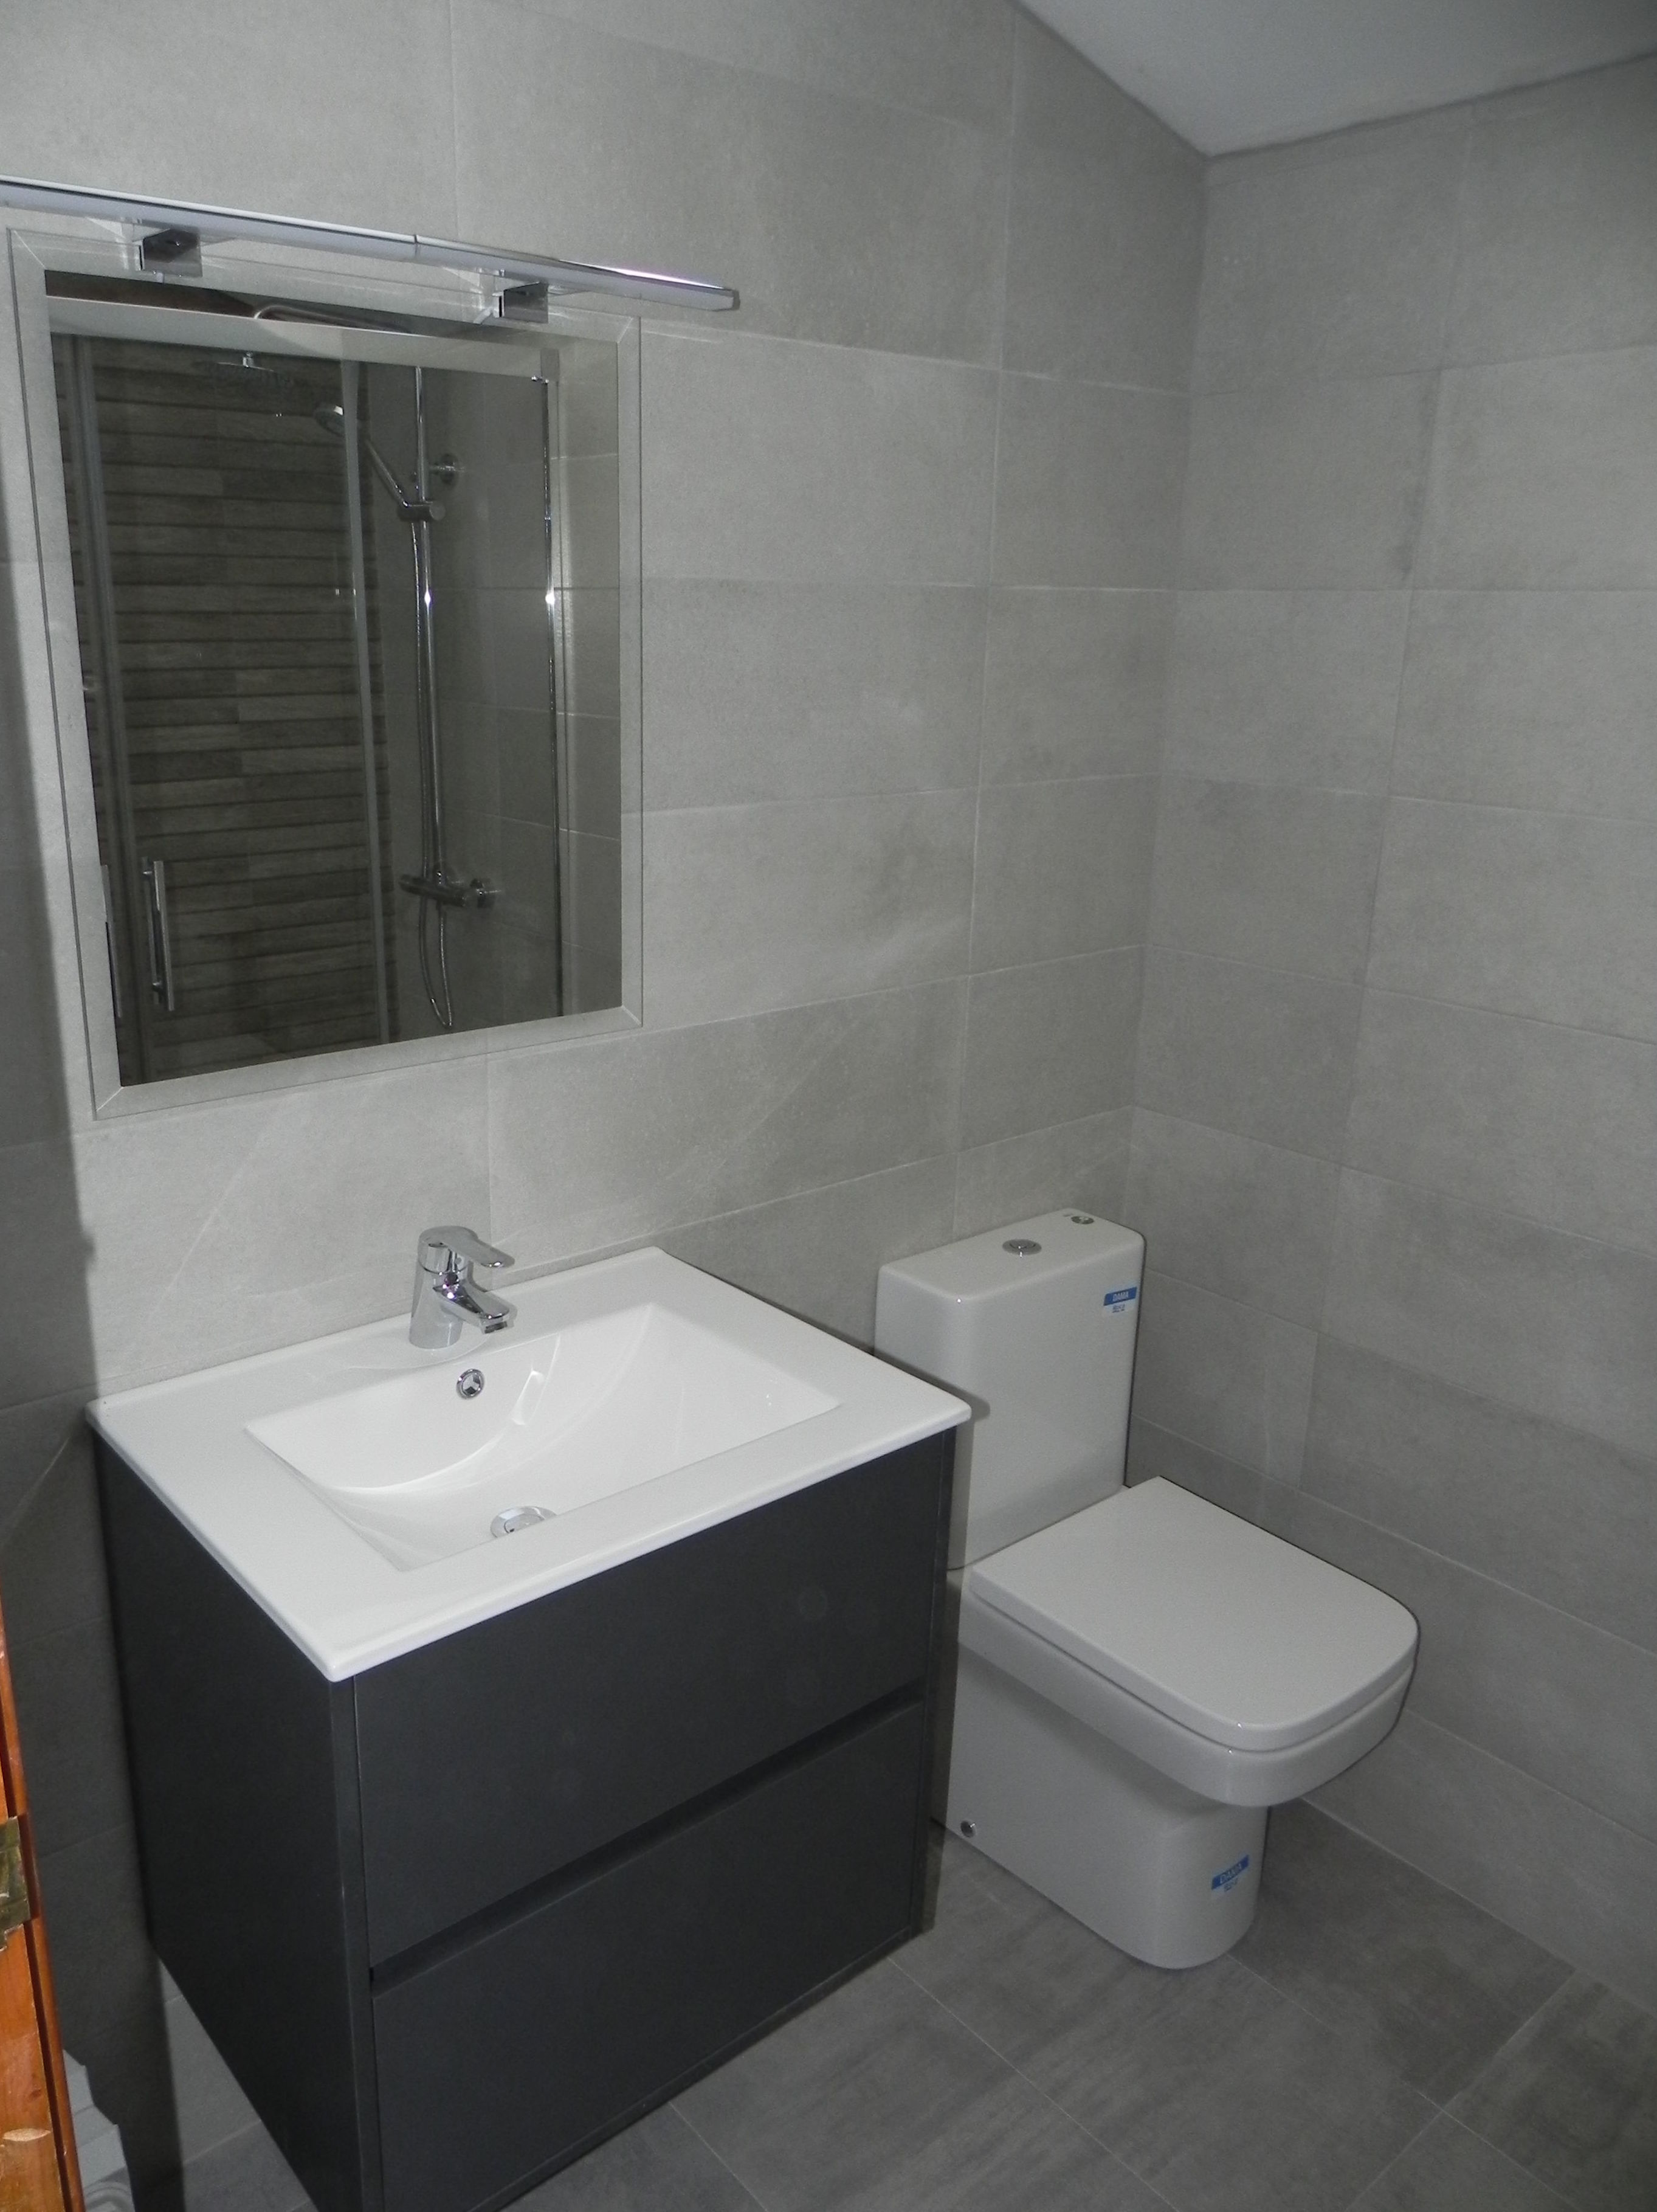 Cuartos de baño en Zaragoza